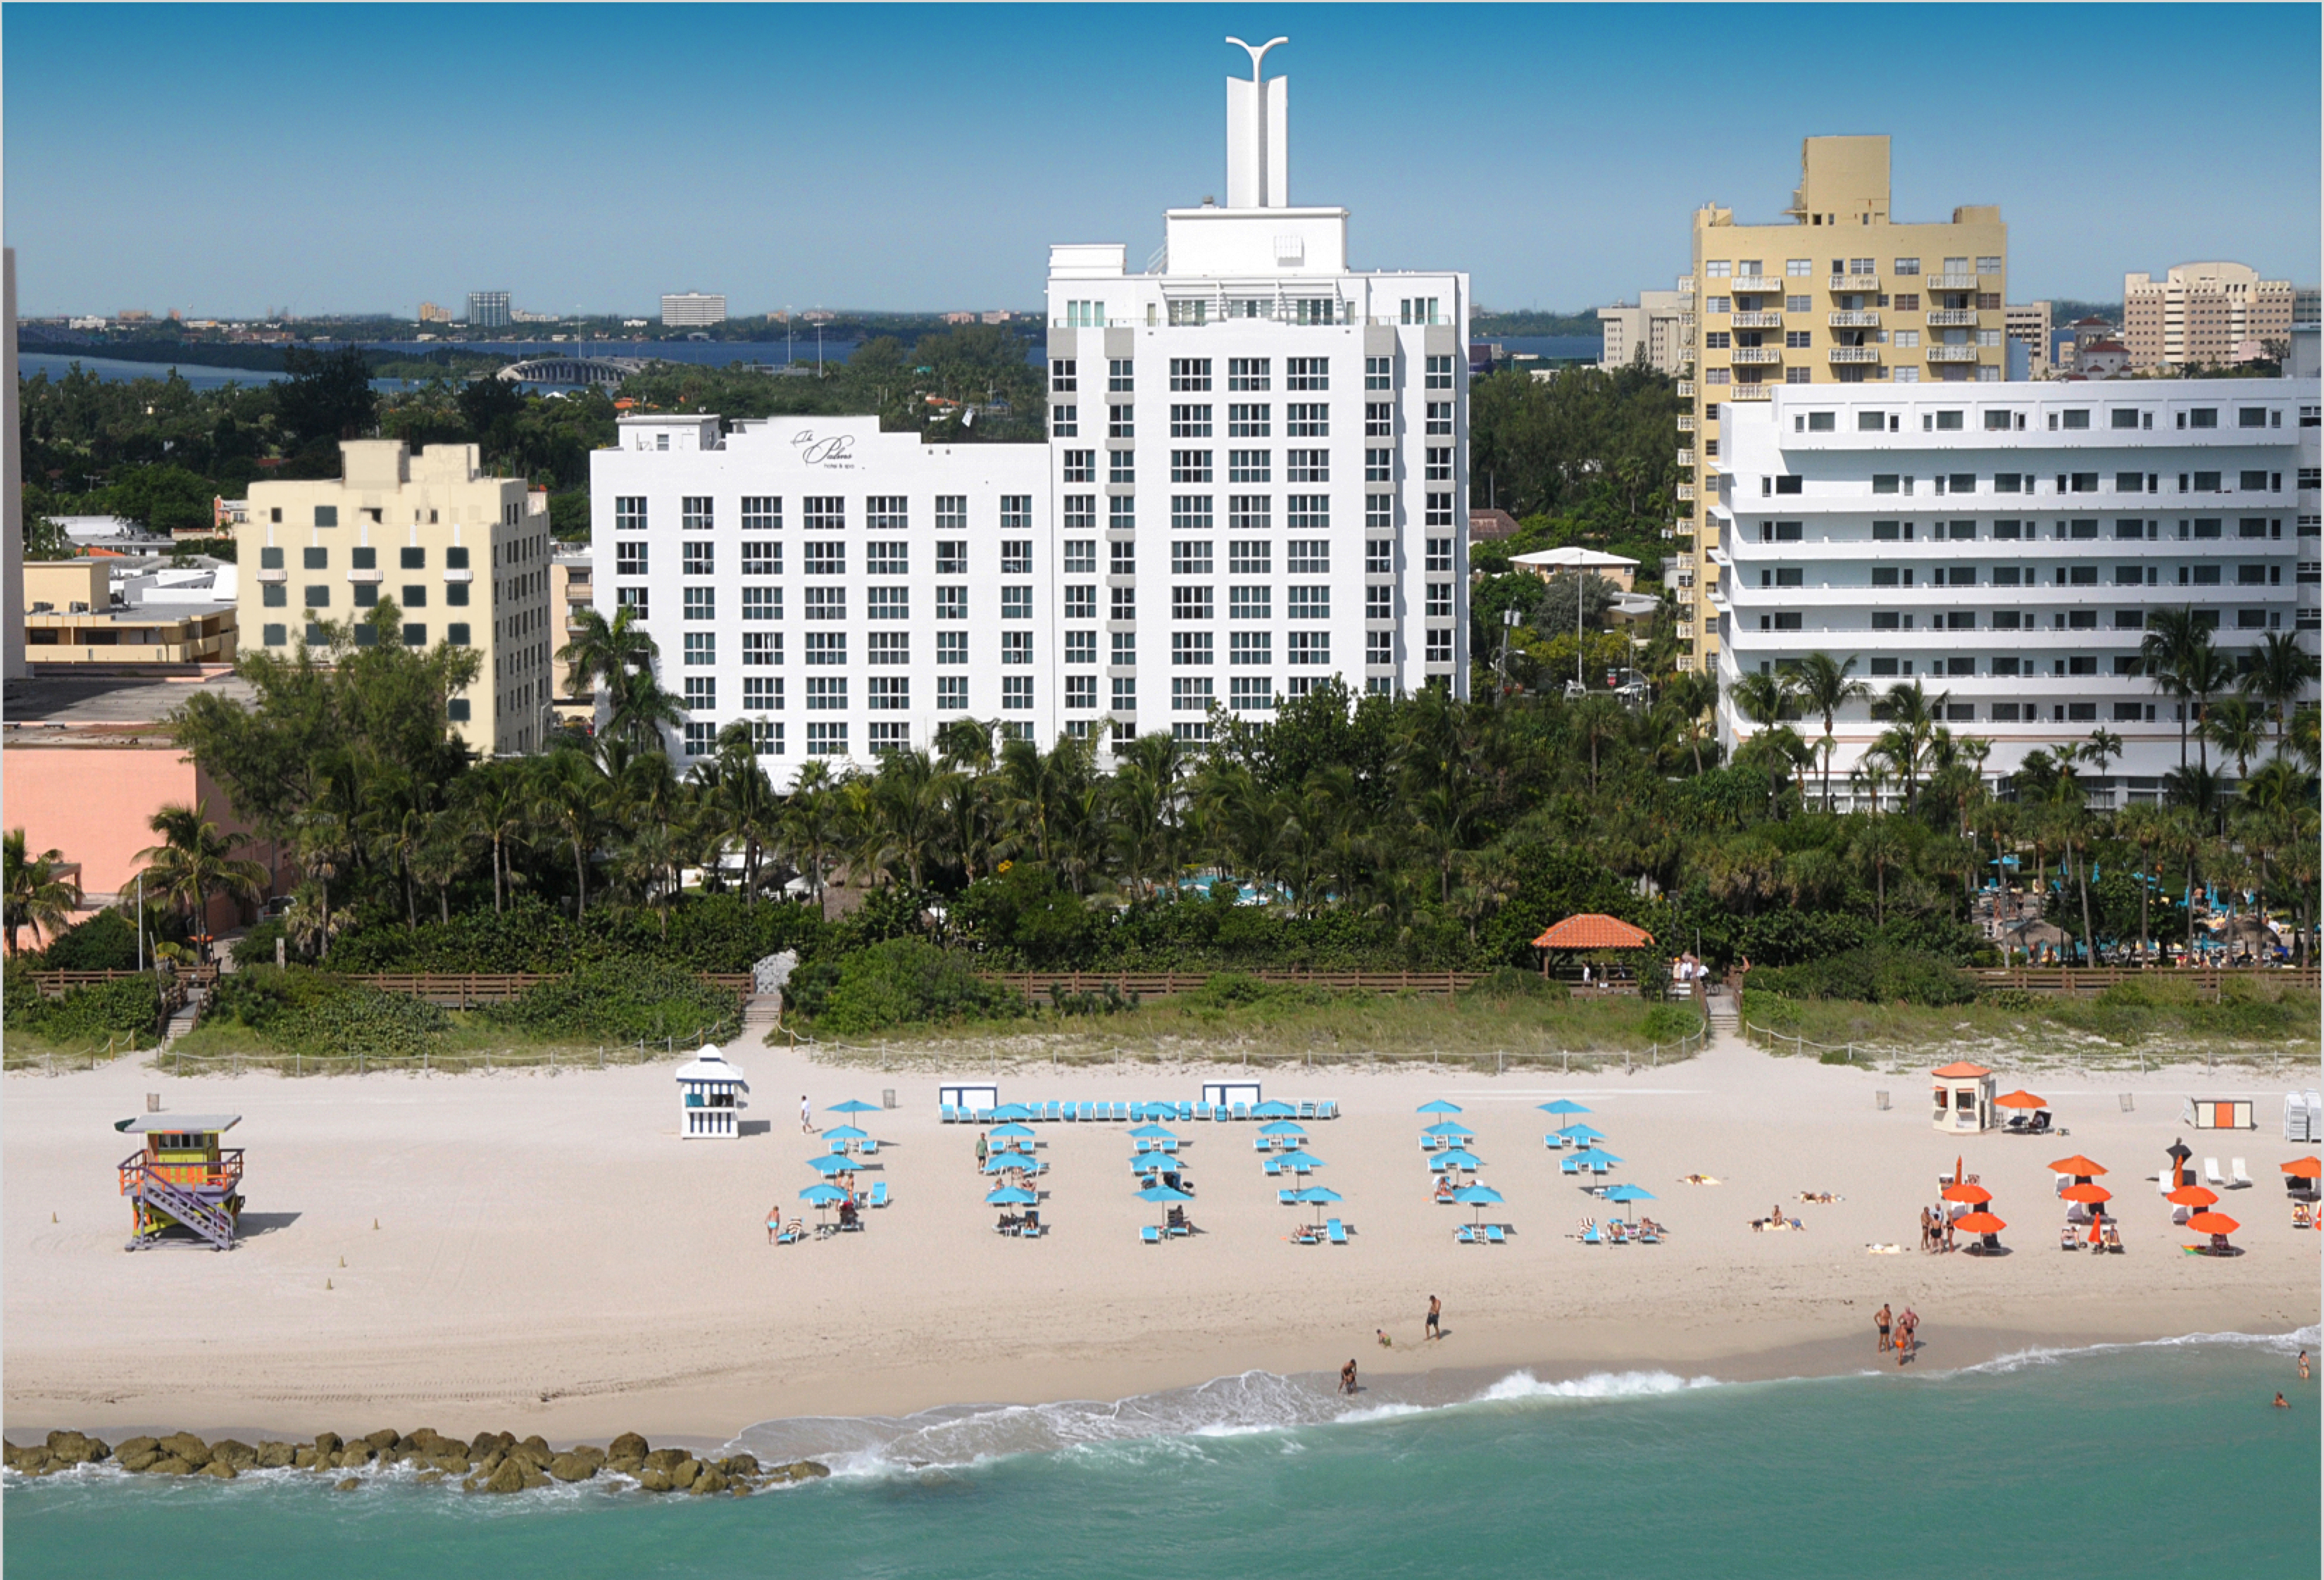 Palms Hotel And Spa Miami Beach